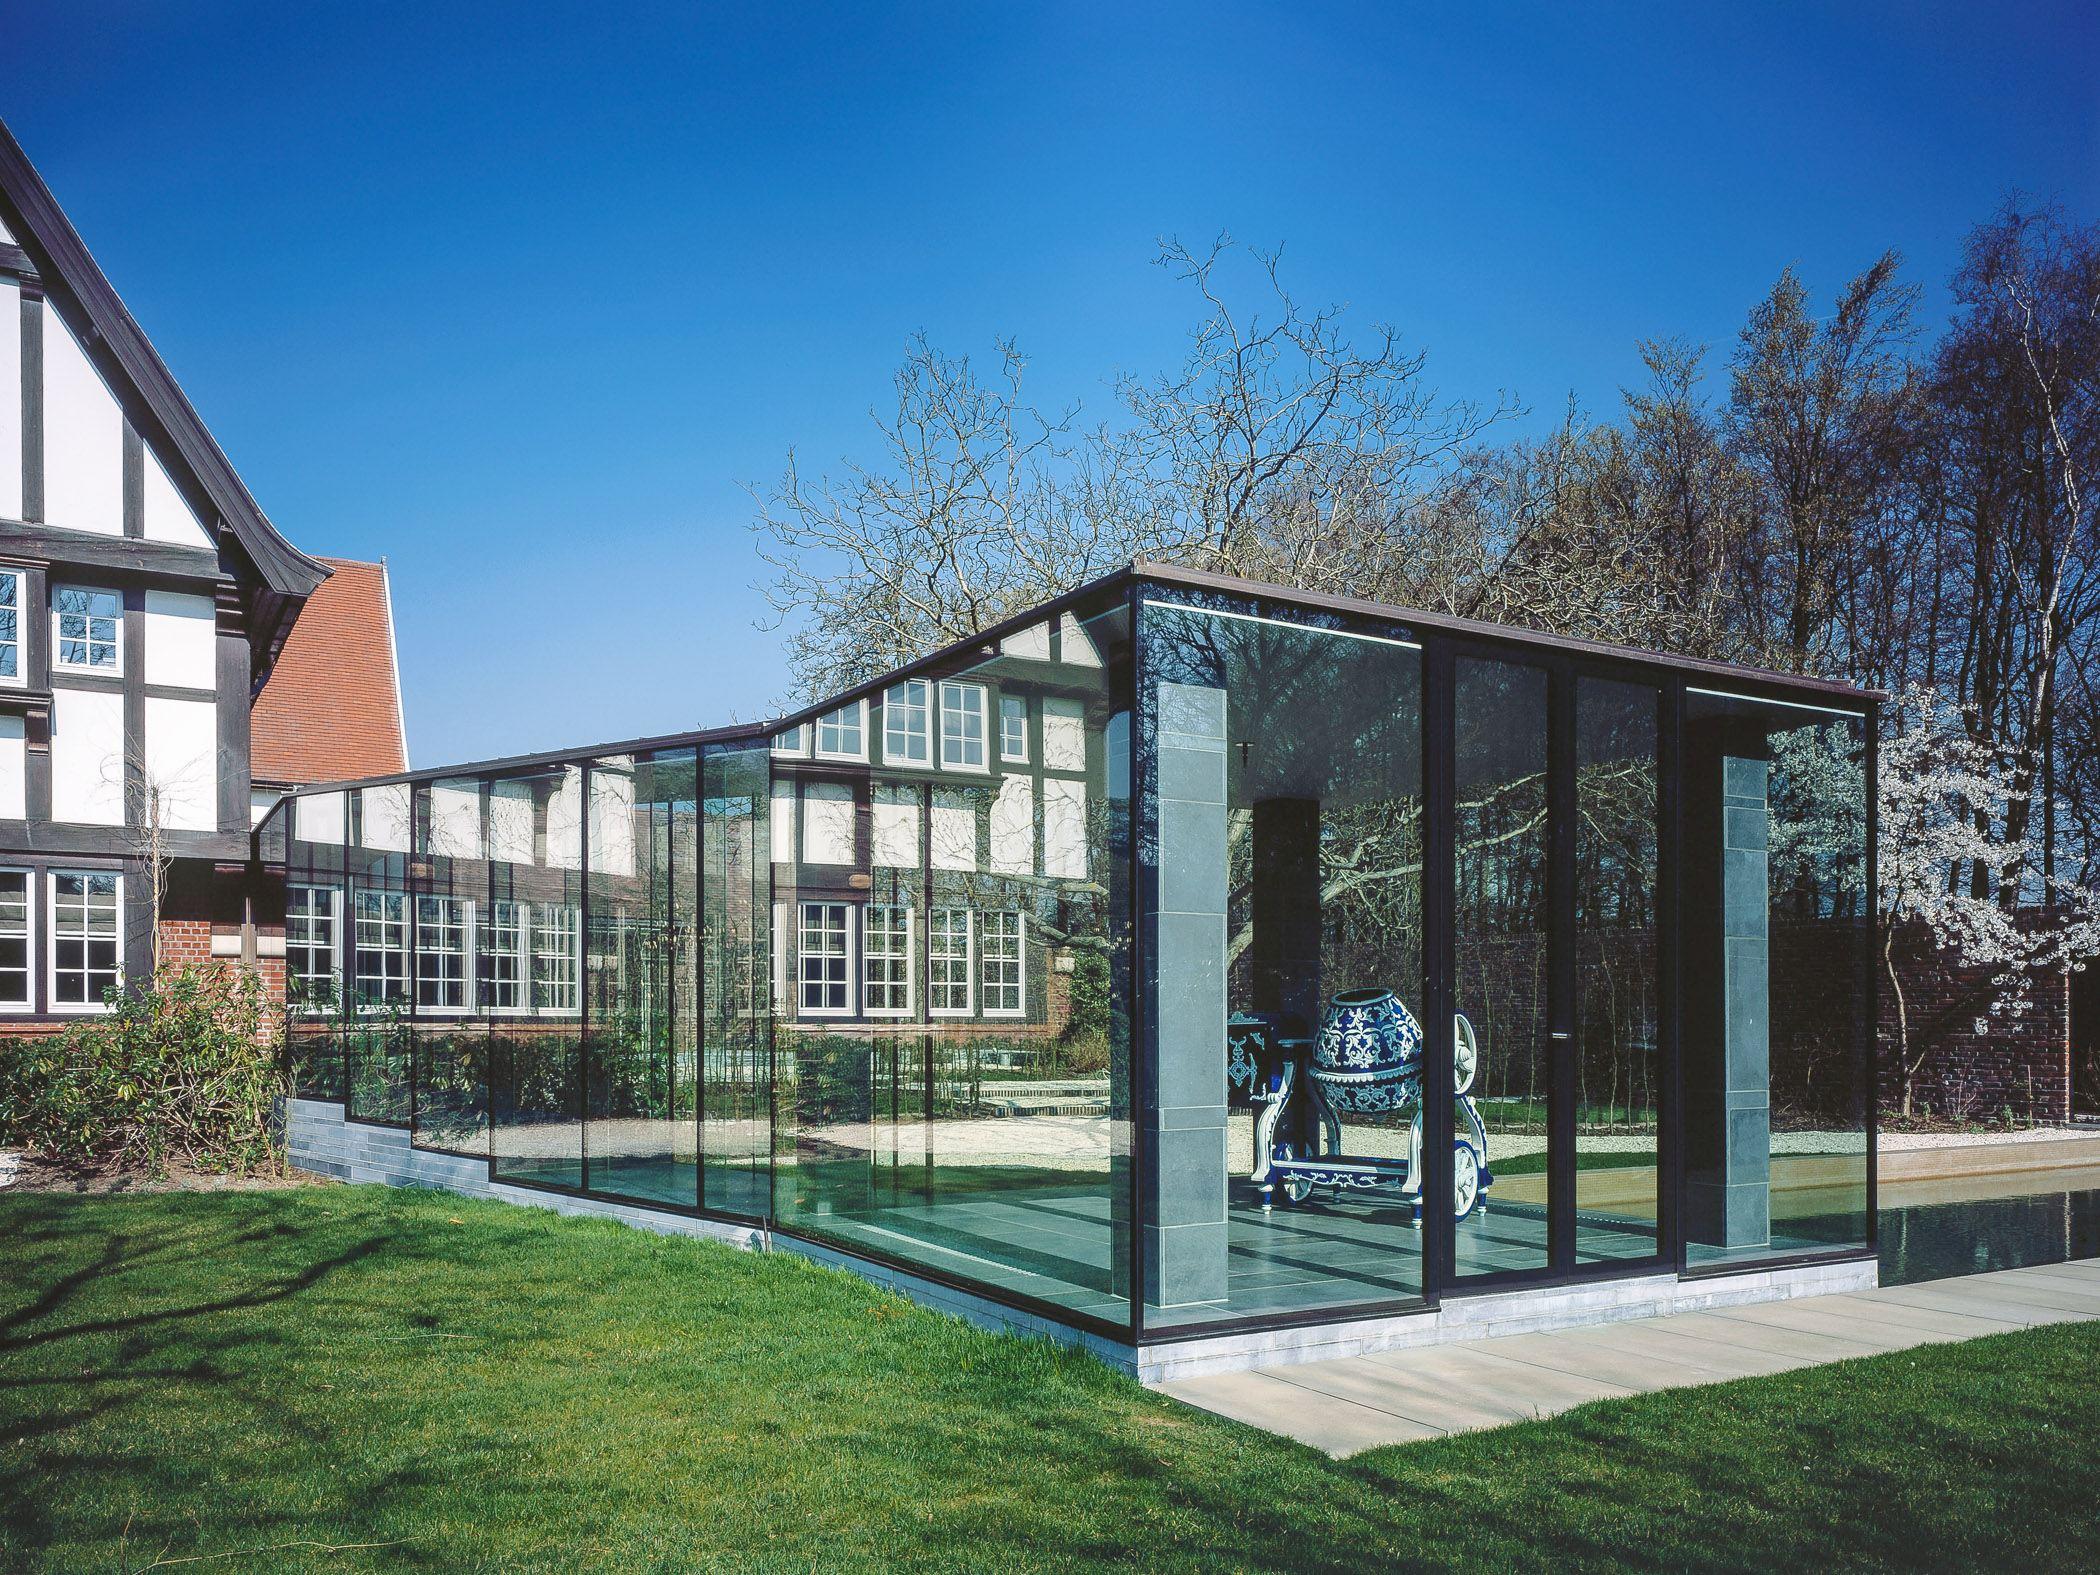 Property For Sale at COURTRAI Belgium, Tudor style Cottage 1000 m2 hab